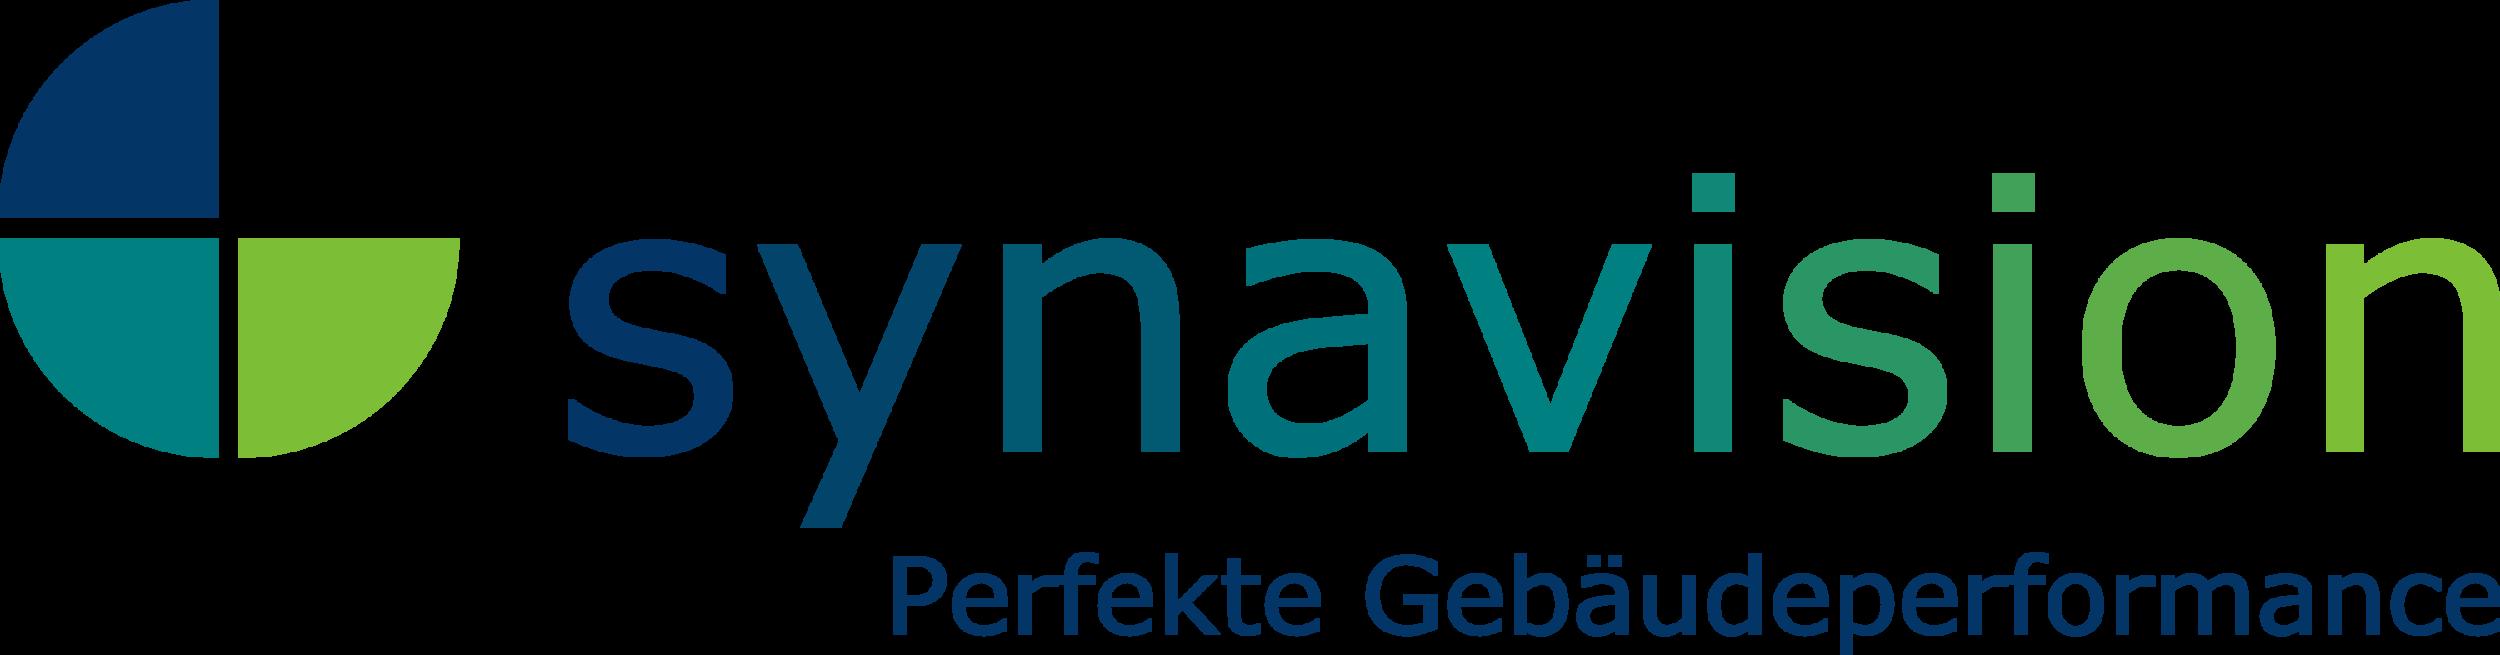 synavision-logo-untertitelt_3000x786 (2).png